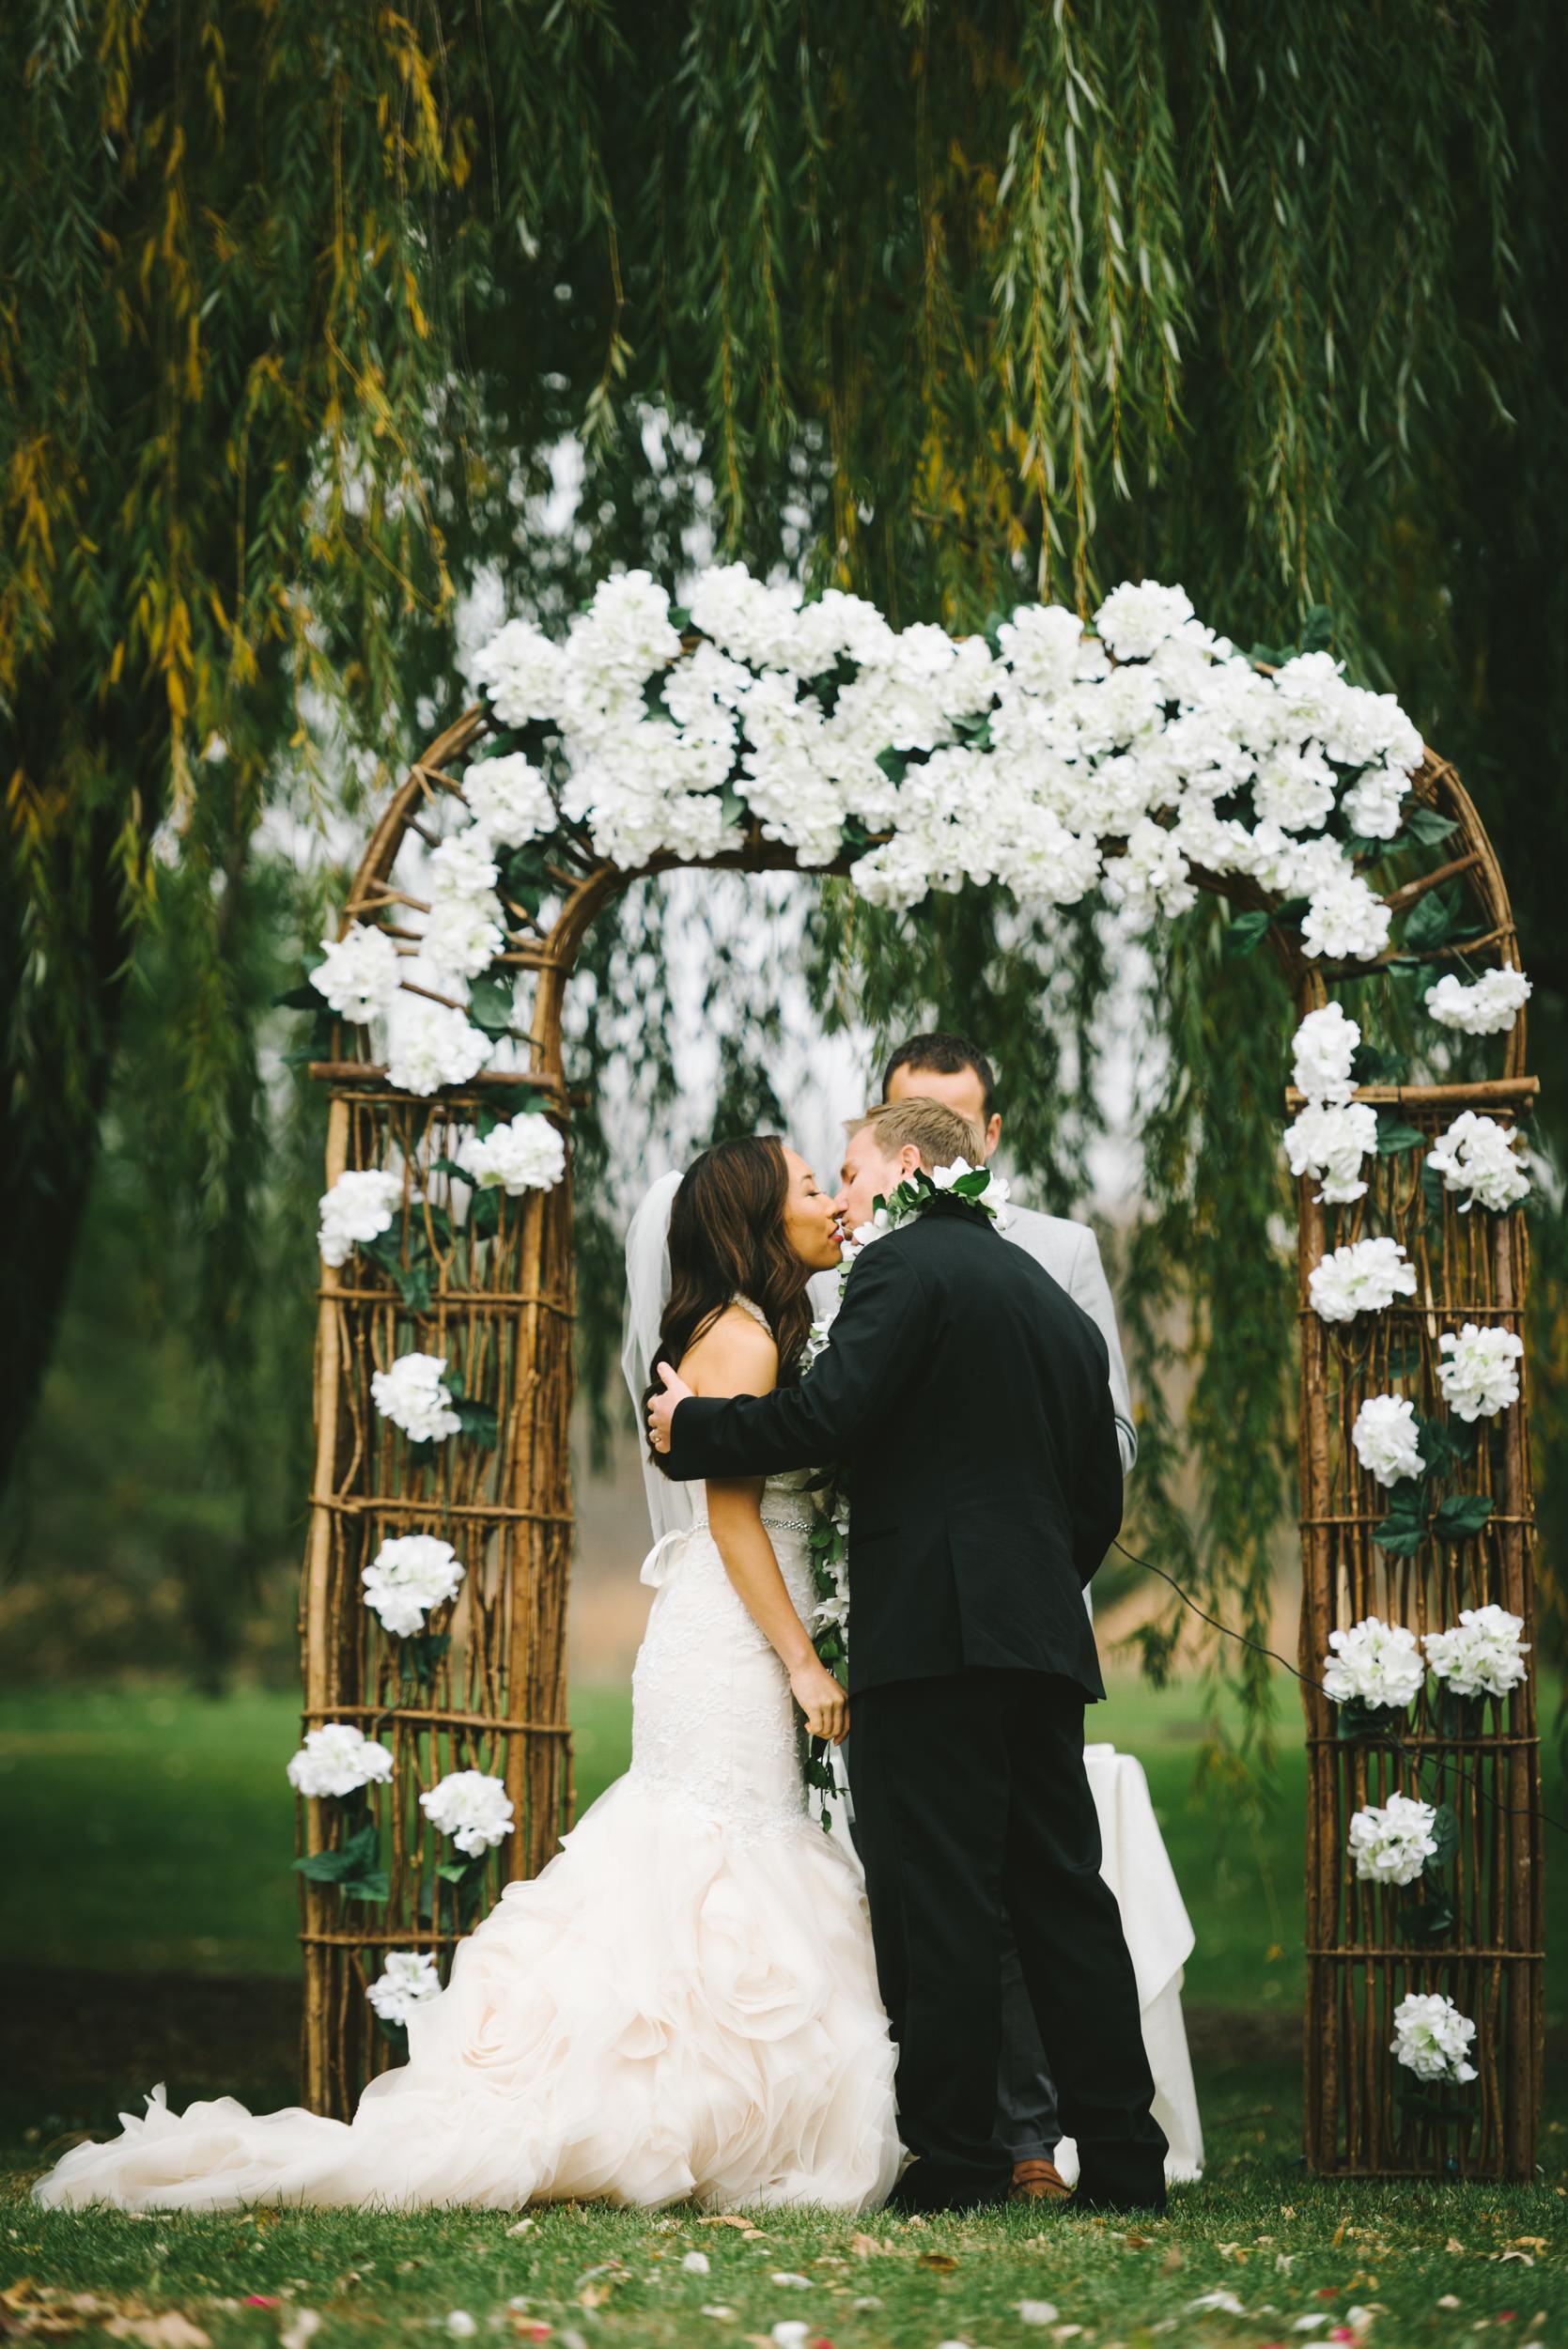 20171029_Wedding-Kristin-Garrett-519.jpg